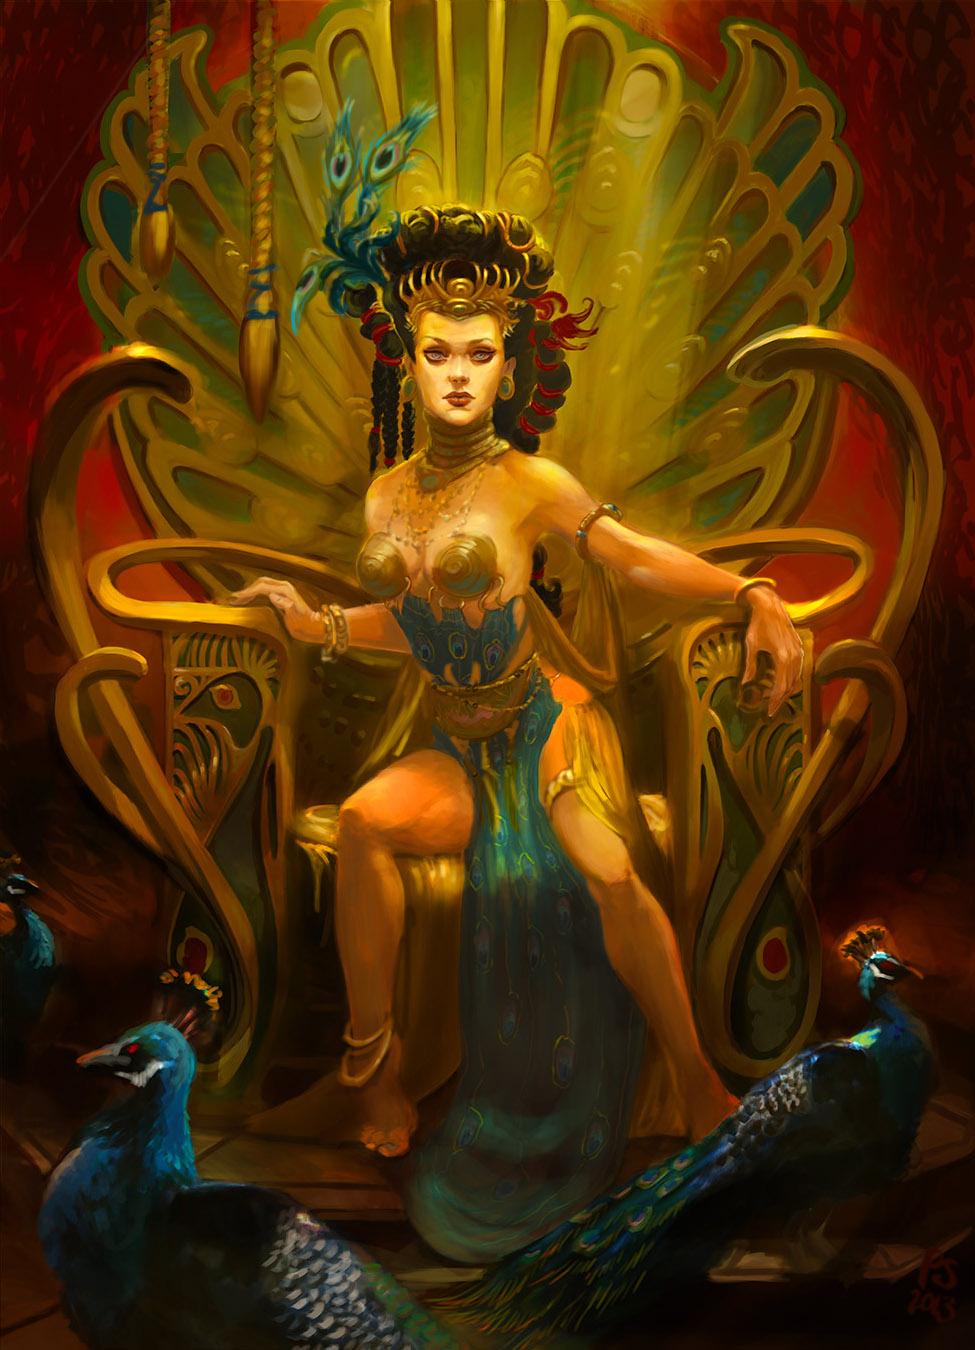 Quodethi Princess